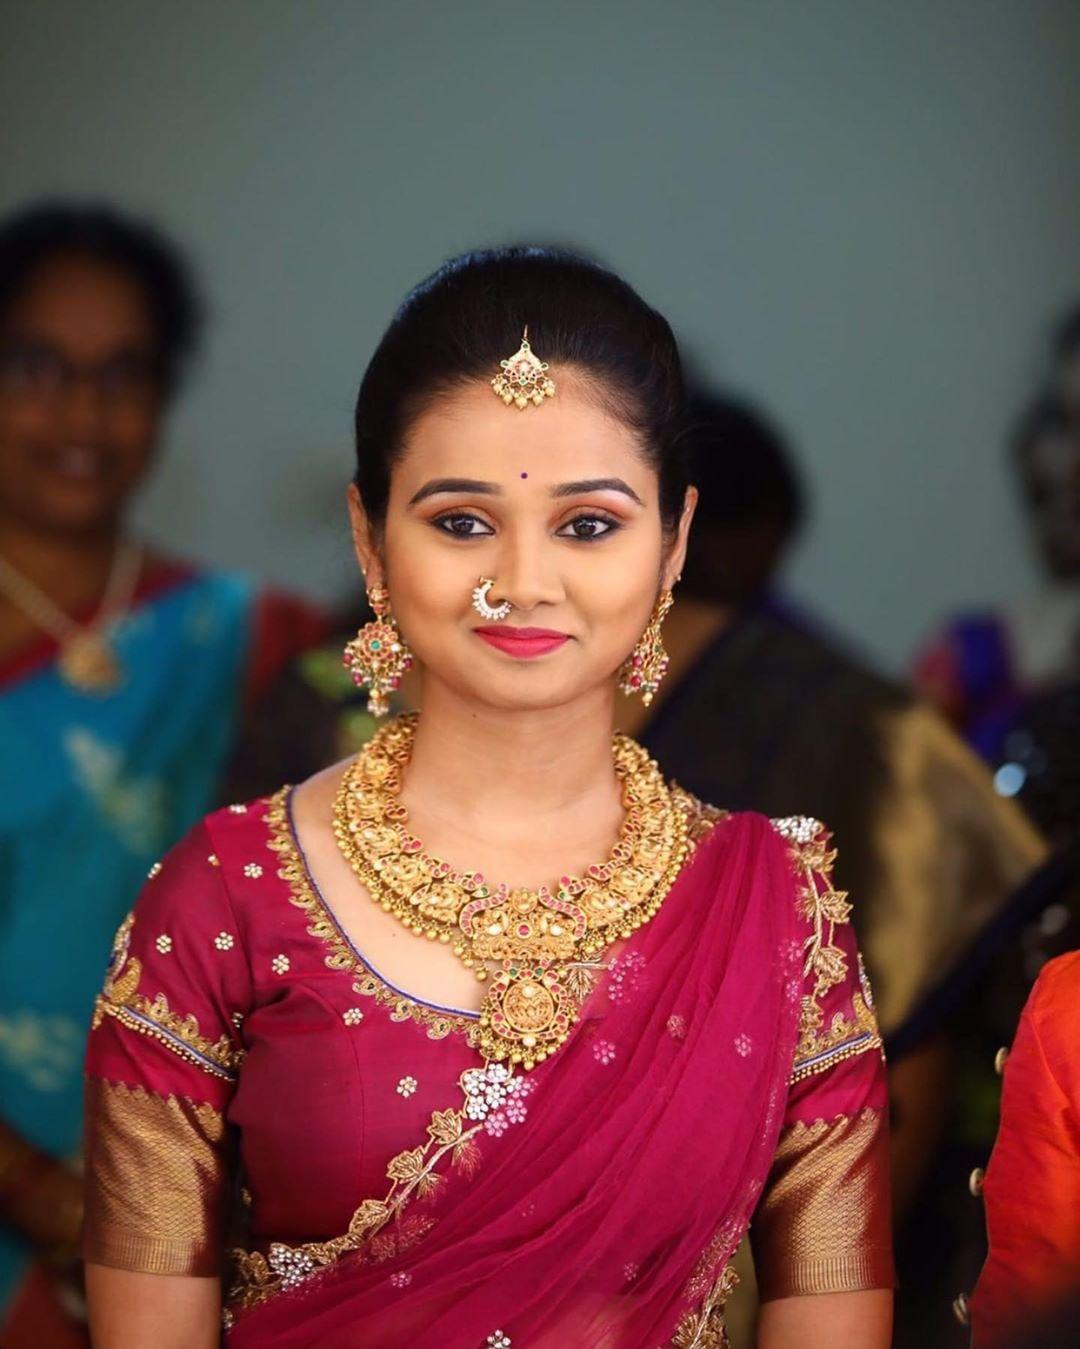 south-indian-wedding-bridal-jewellery-1